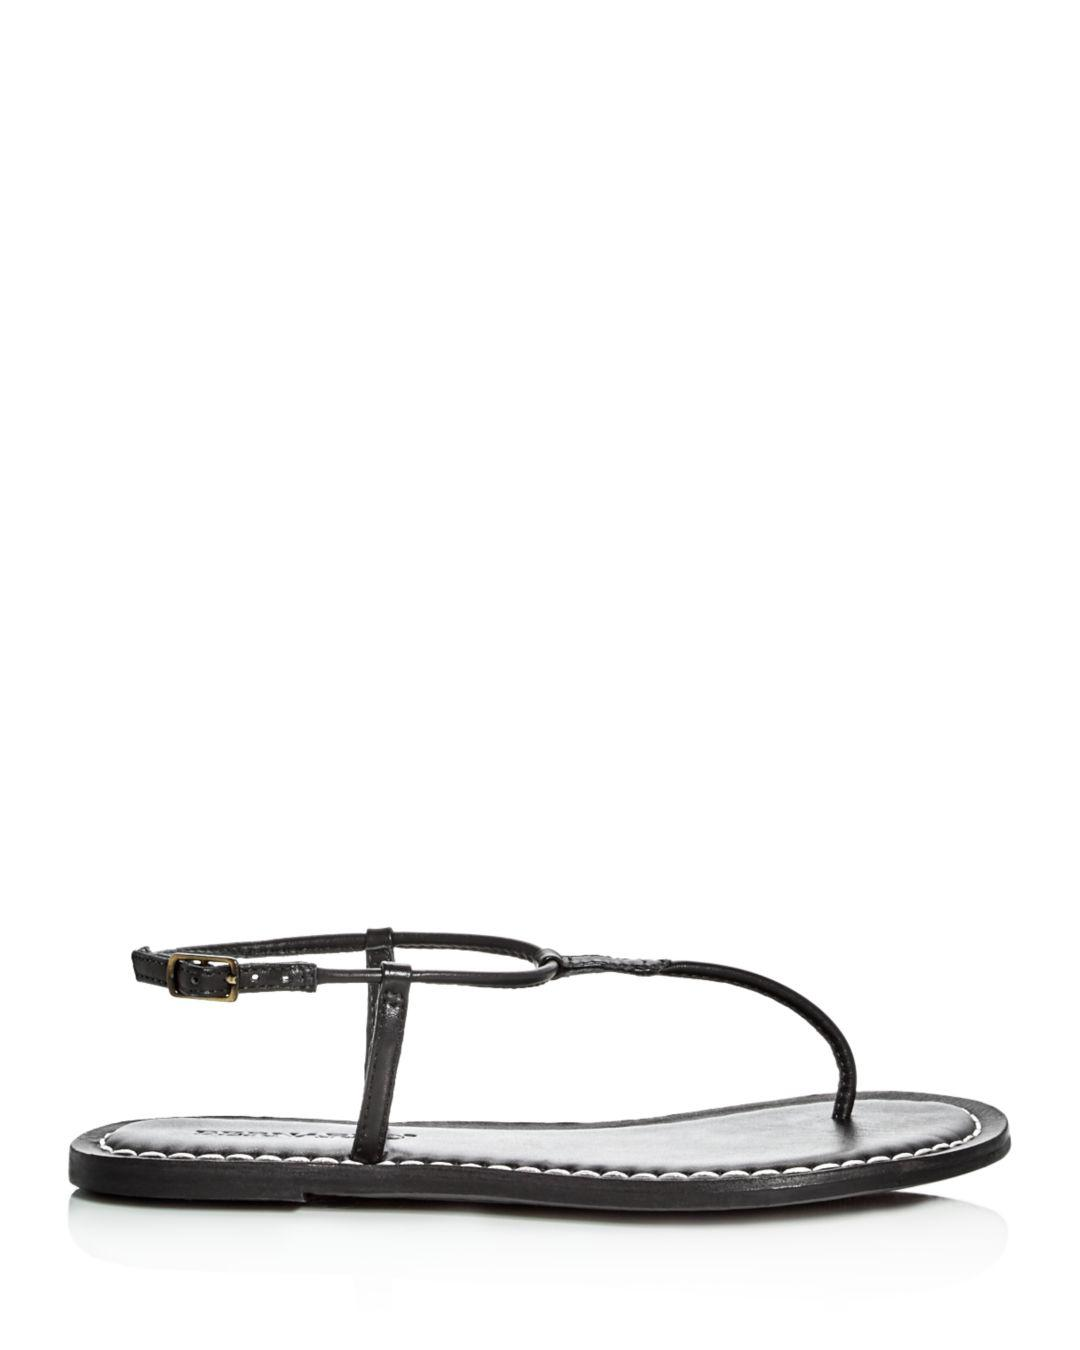 98f8d80c23c Lyst - Bernardo Lilly T-strap Thong Sandals in Black